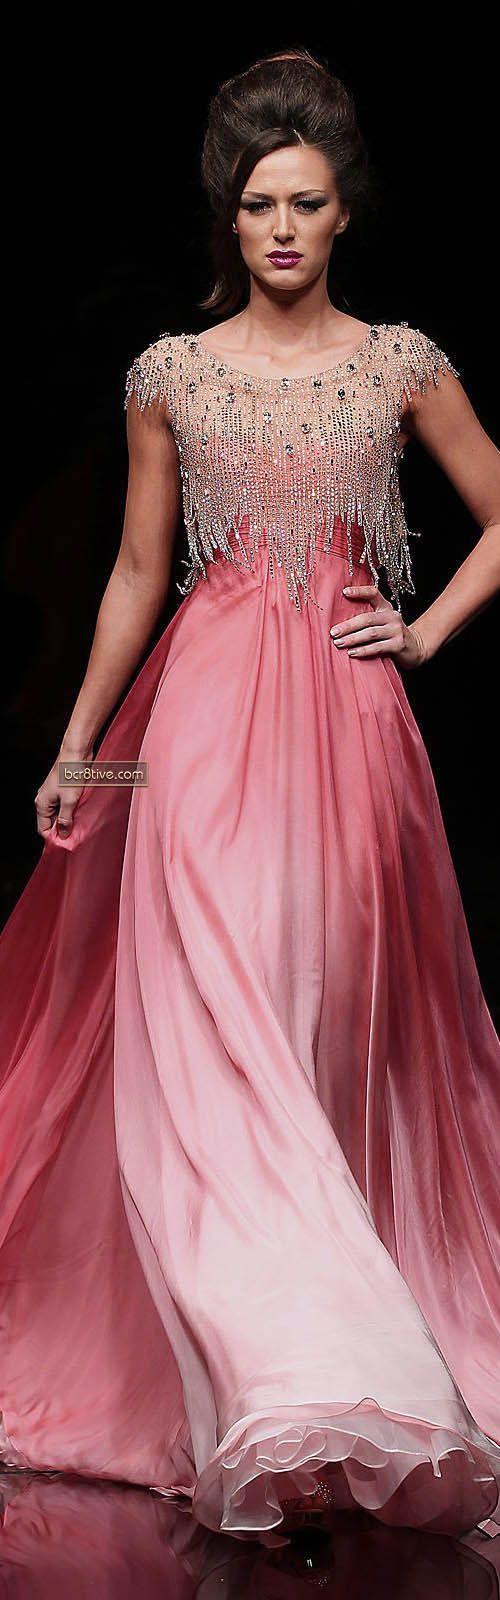 50 best Fashion - Hanna Toumajean images on Pinterest | Winter 2014 ...